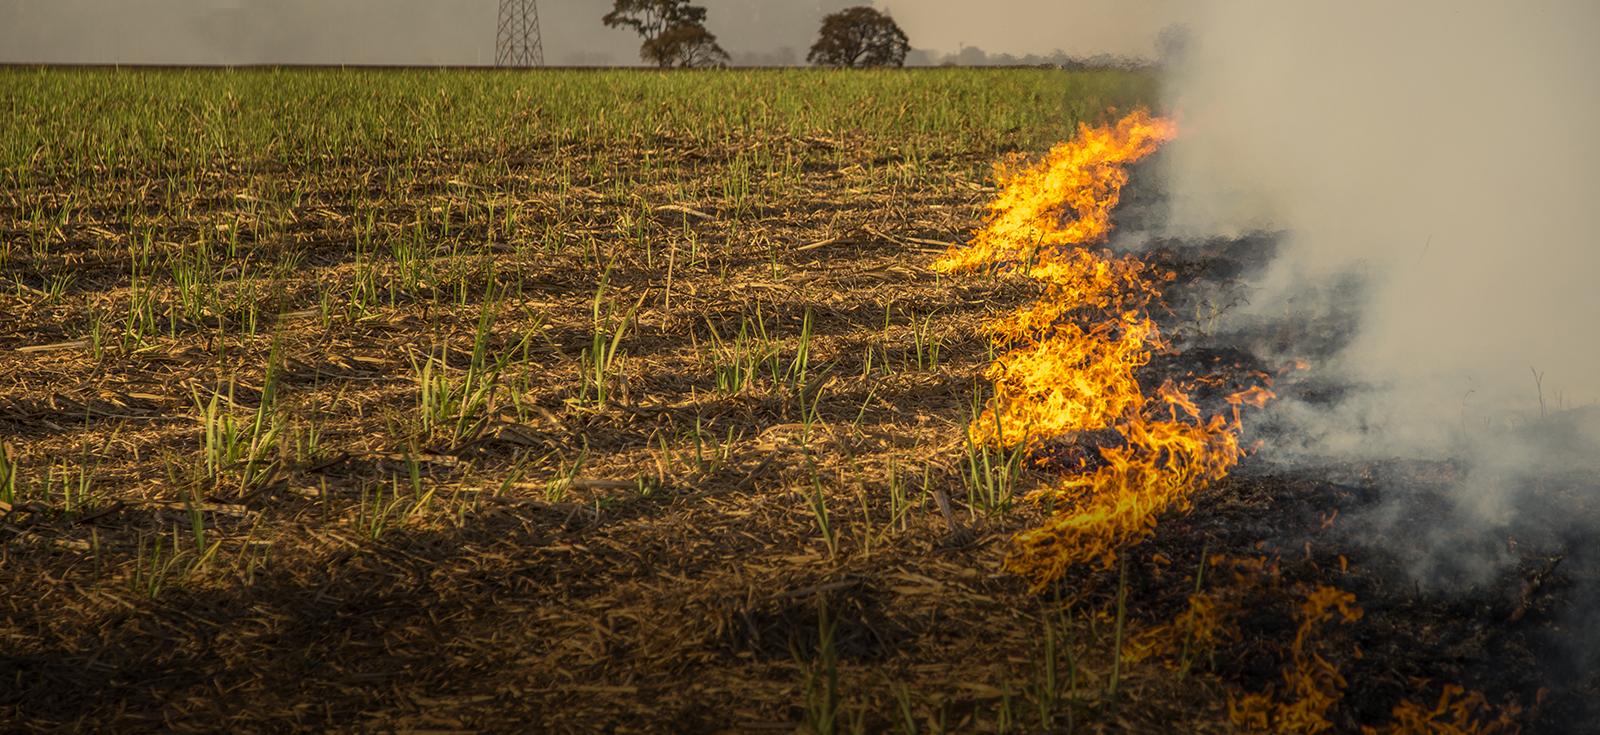 Fire incidences database for Punjab (2012 - 2018)